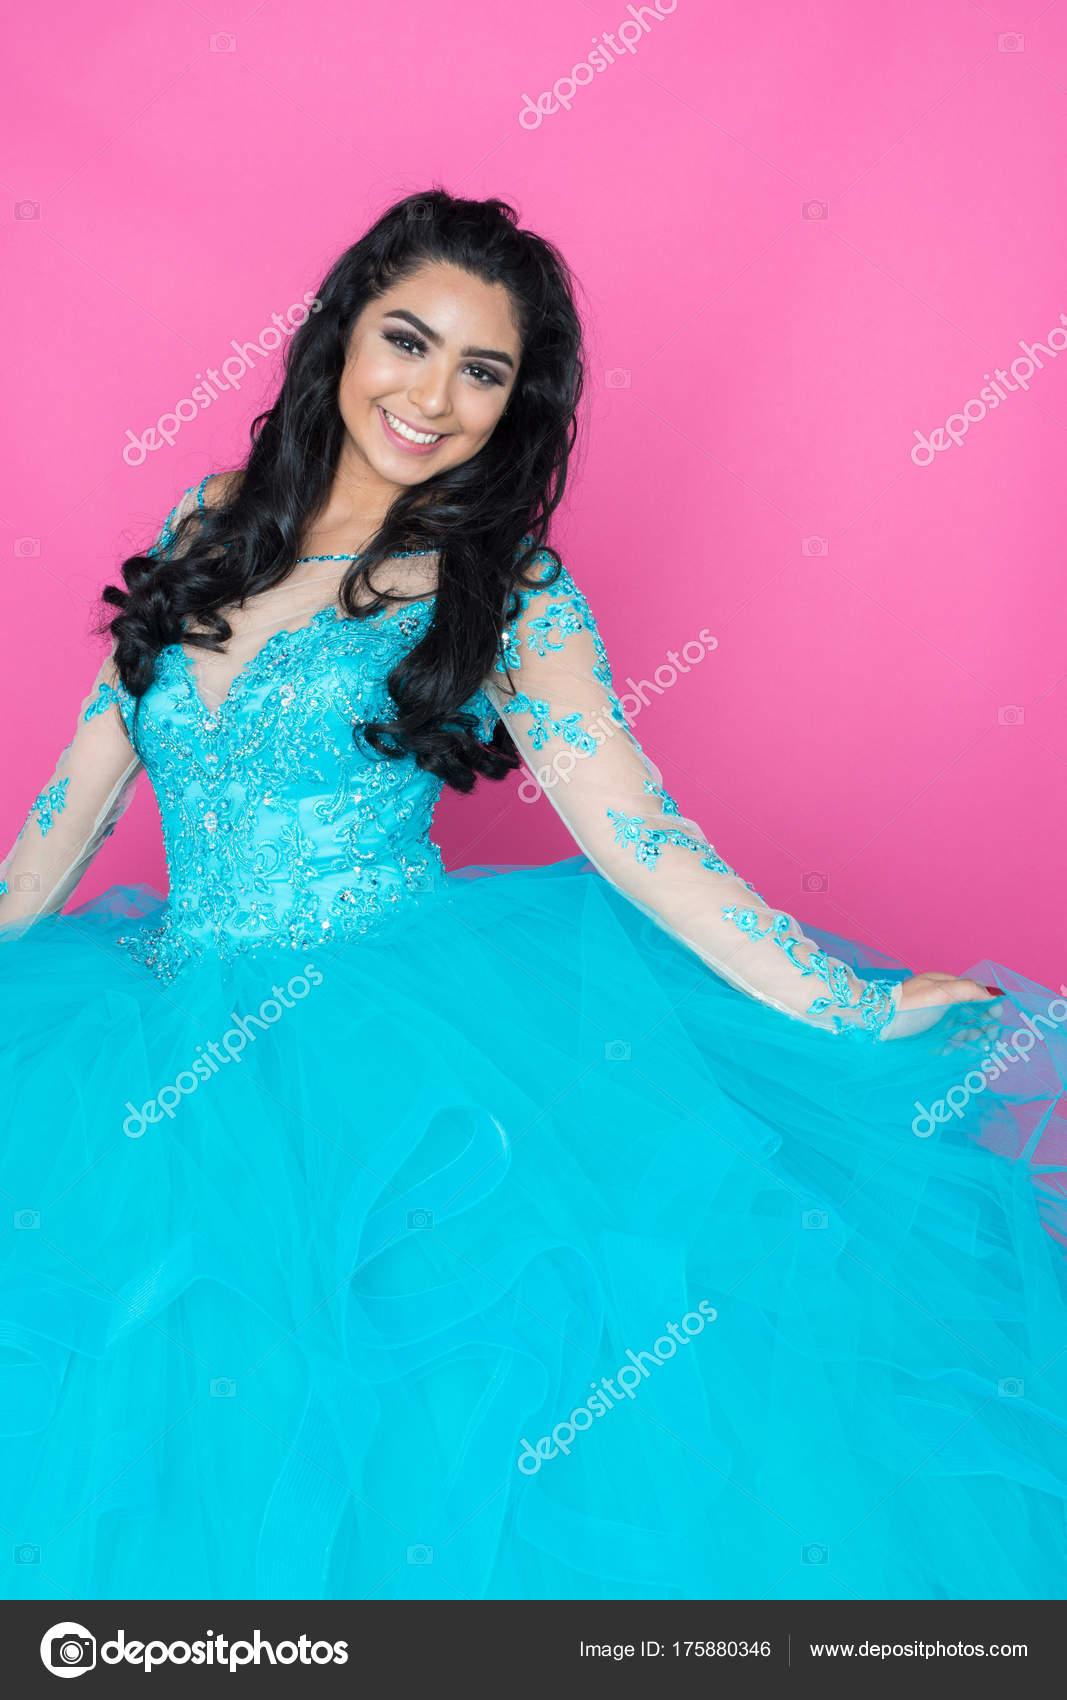 Teen In Prom Kleid — Stockfoto © rmarmion #175880346